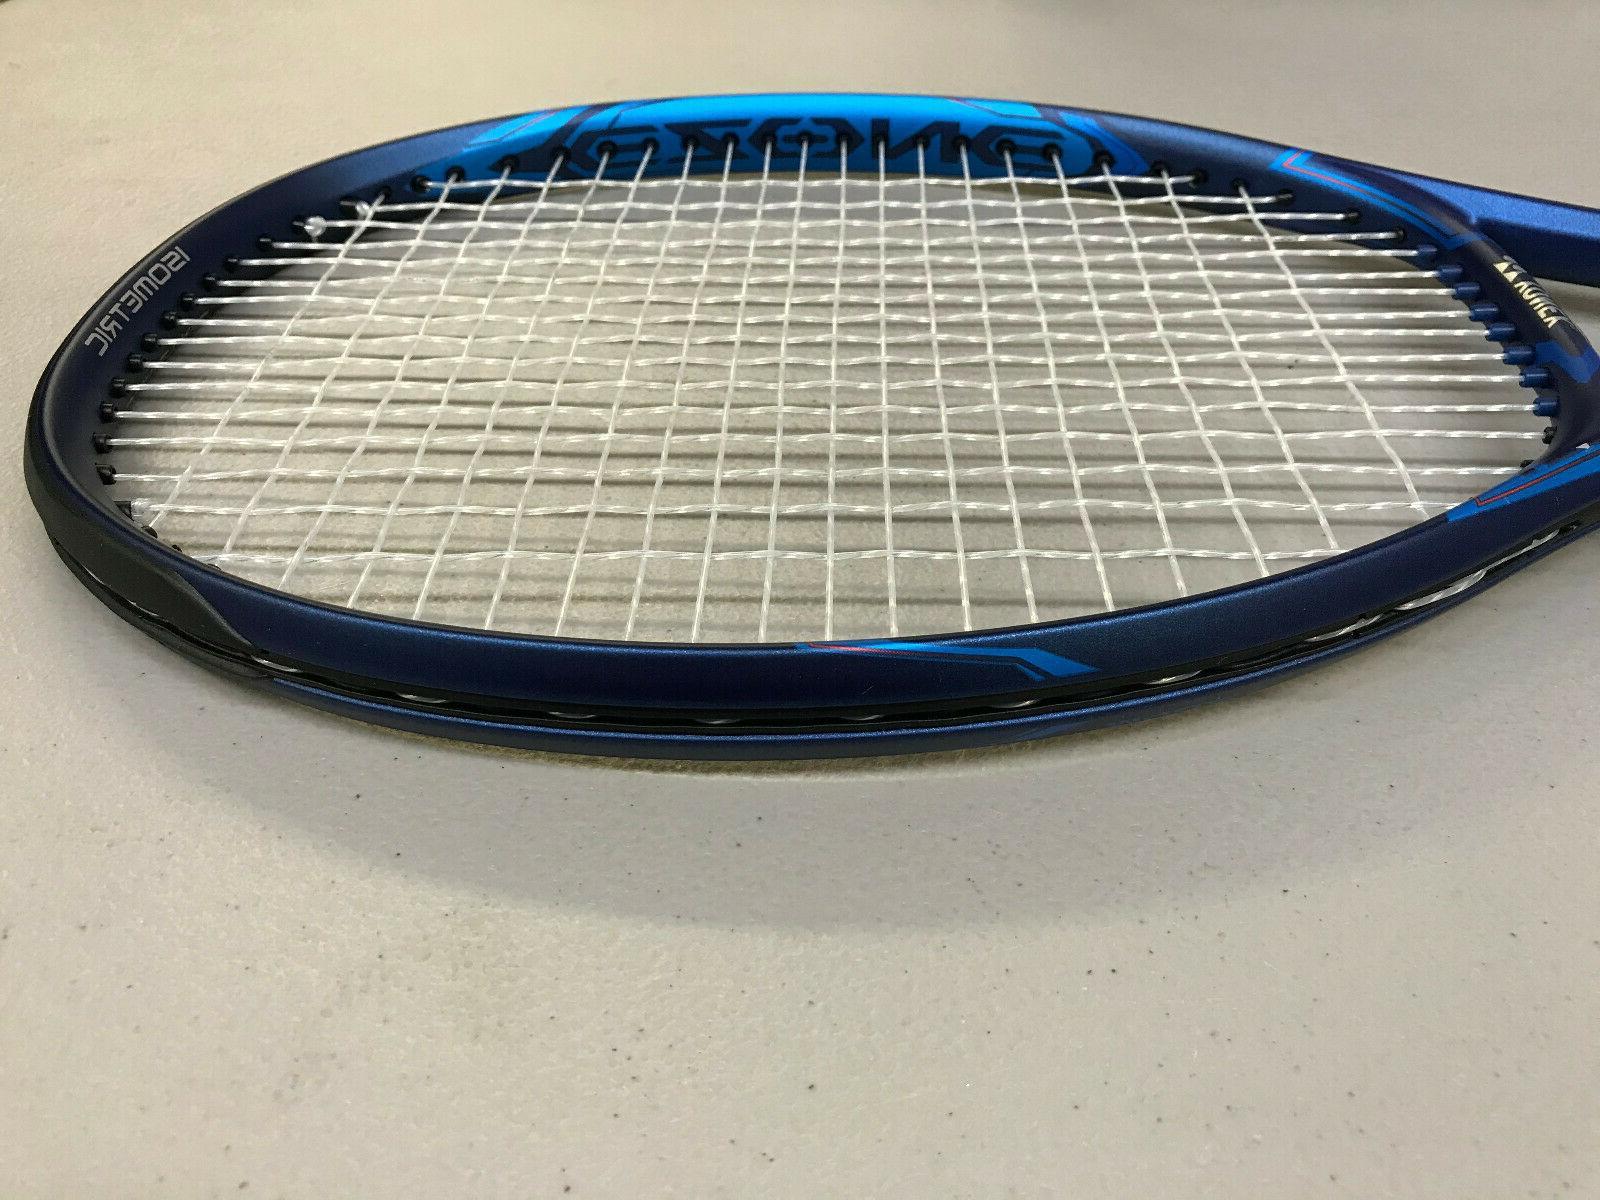 Yonex Ezone 98 New Tennis Racquet Size